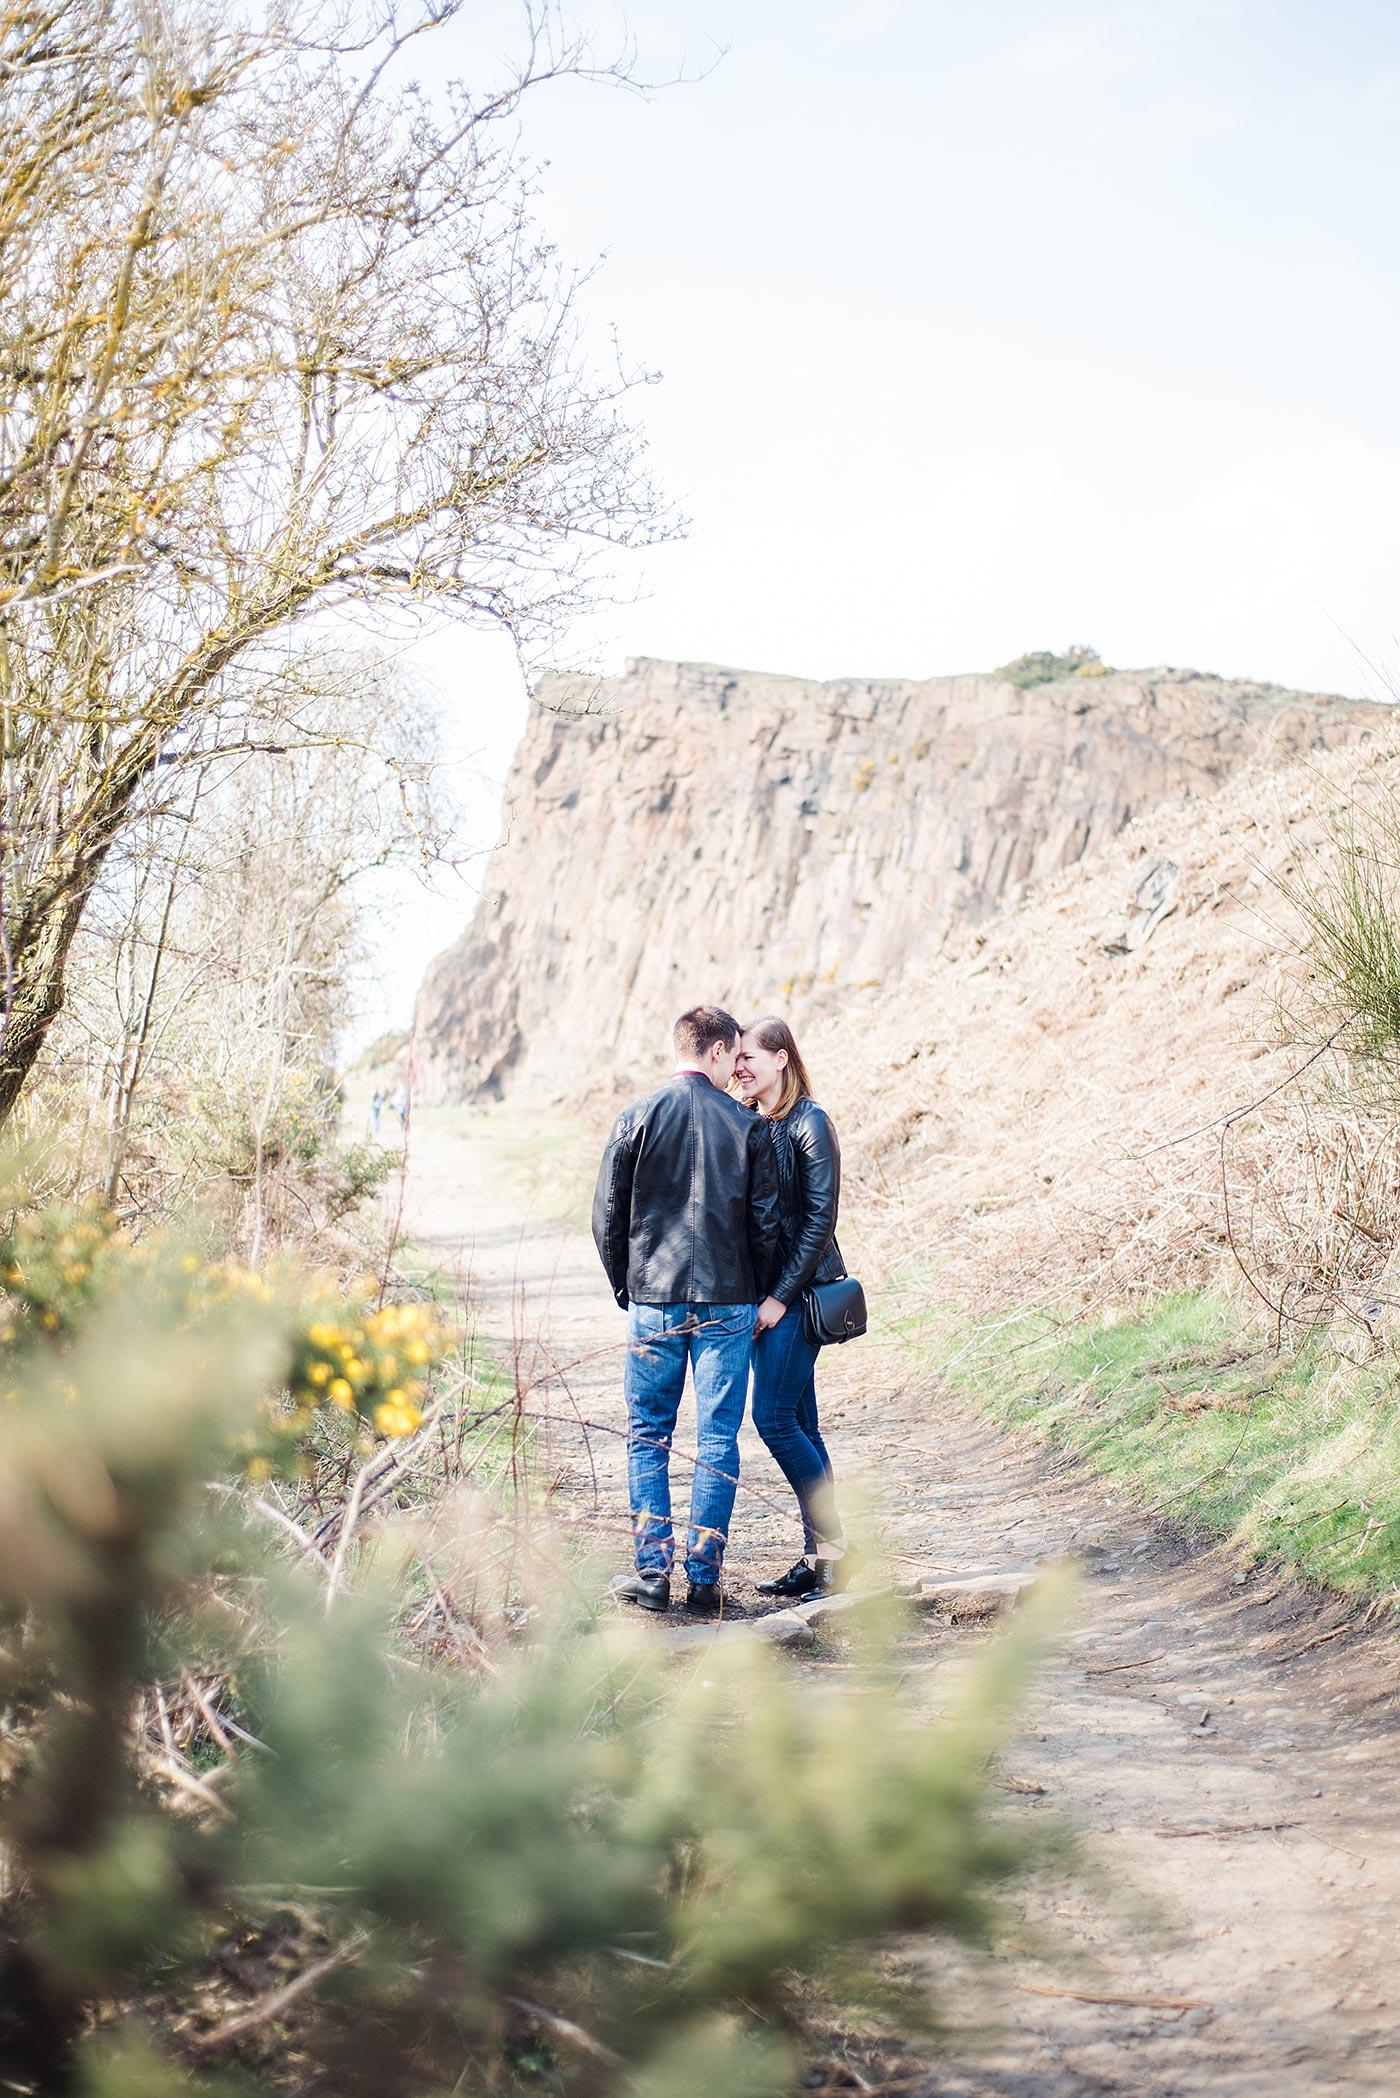 Proposal Photographs Edinburgh Salisbury Crags